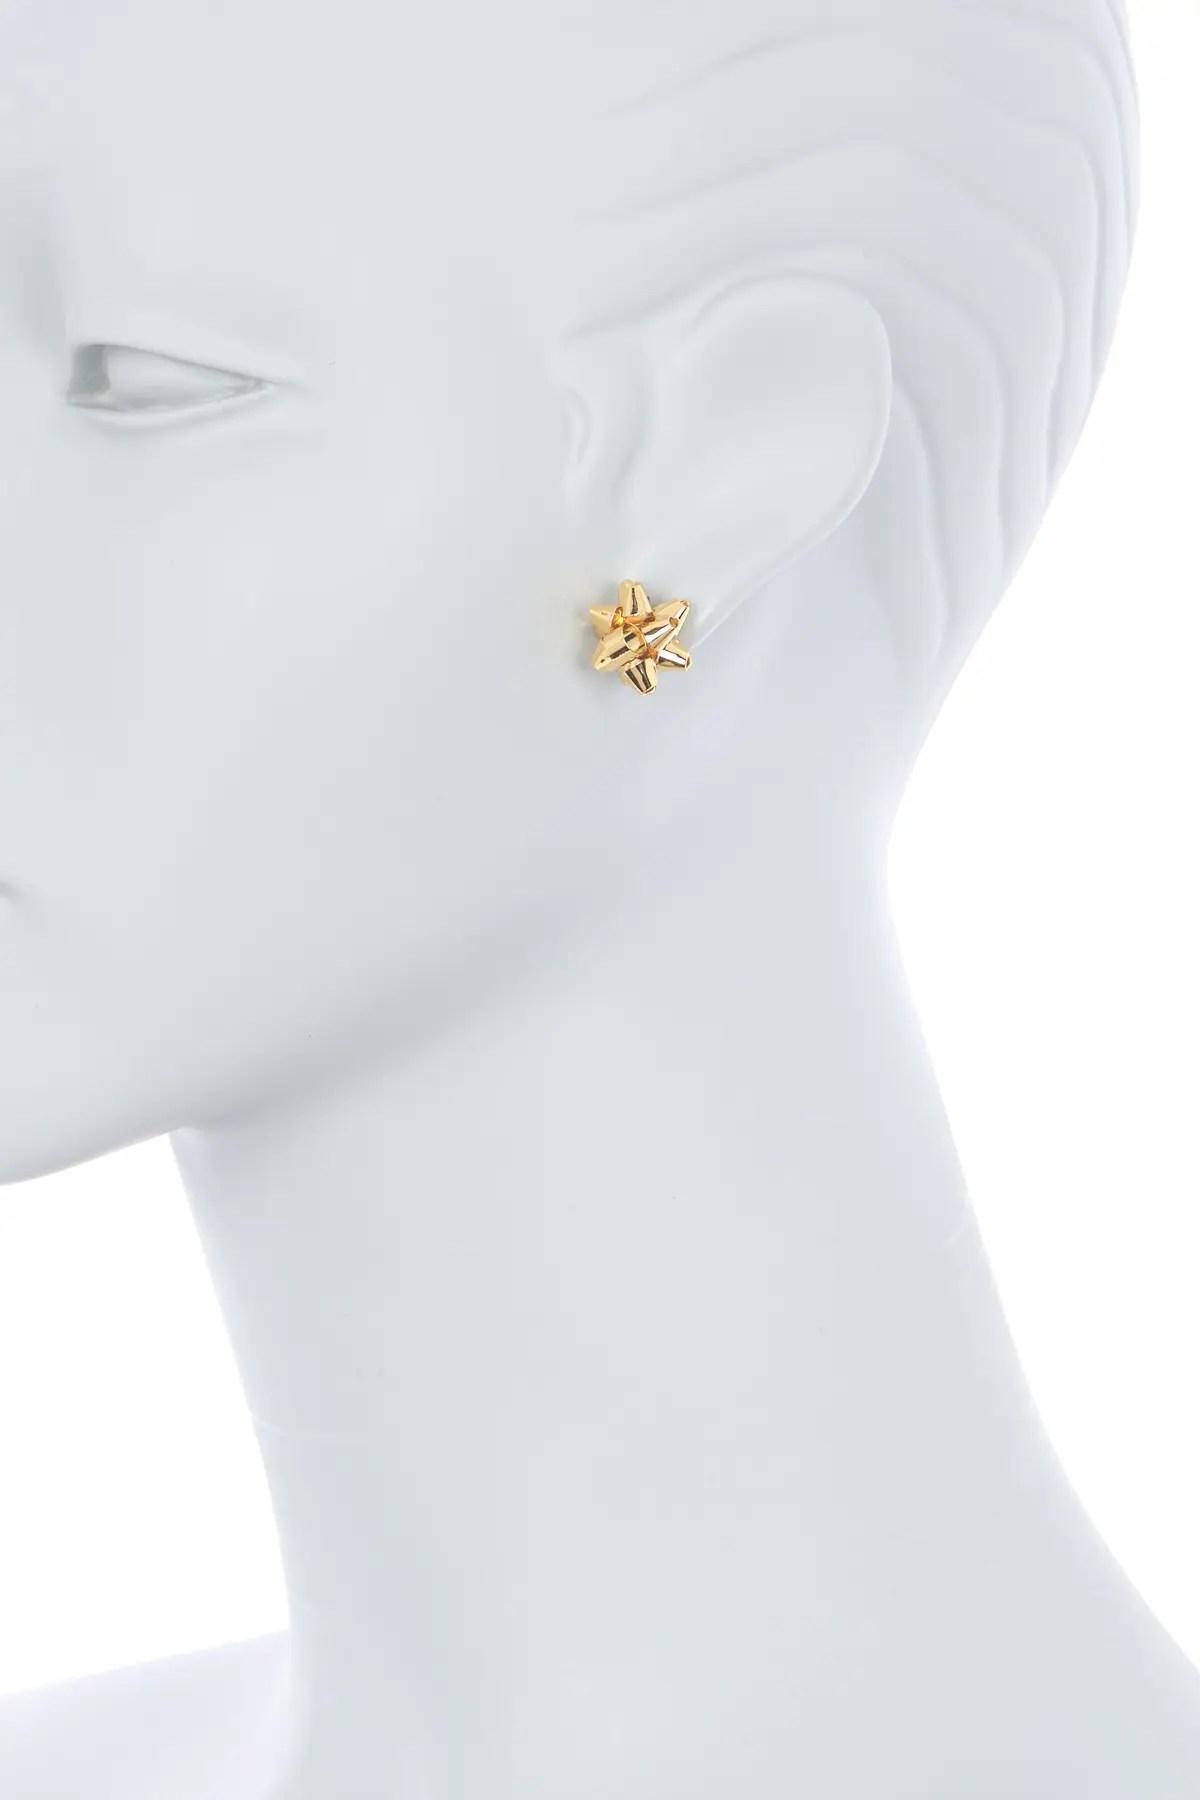 kate spade new york bourgeois bow 14k gold plated stud earrings nordstrom rack